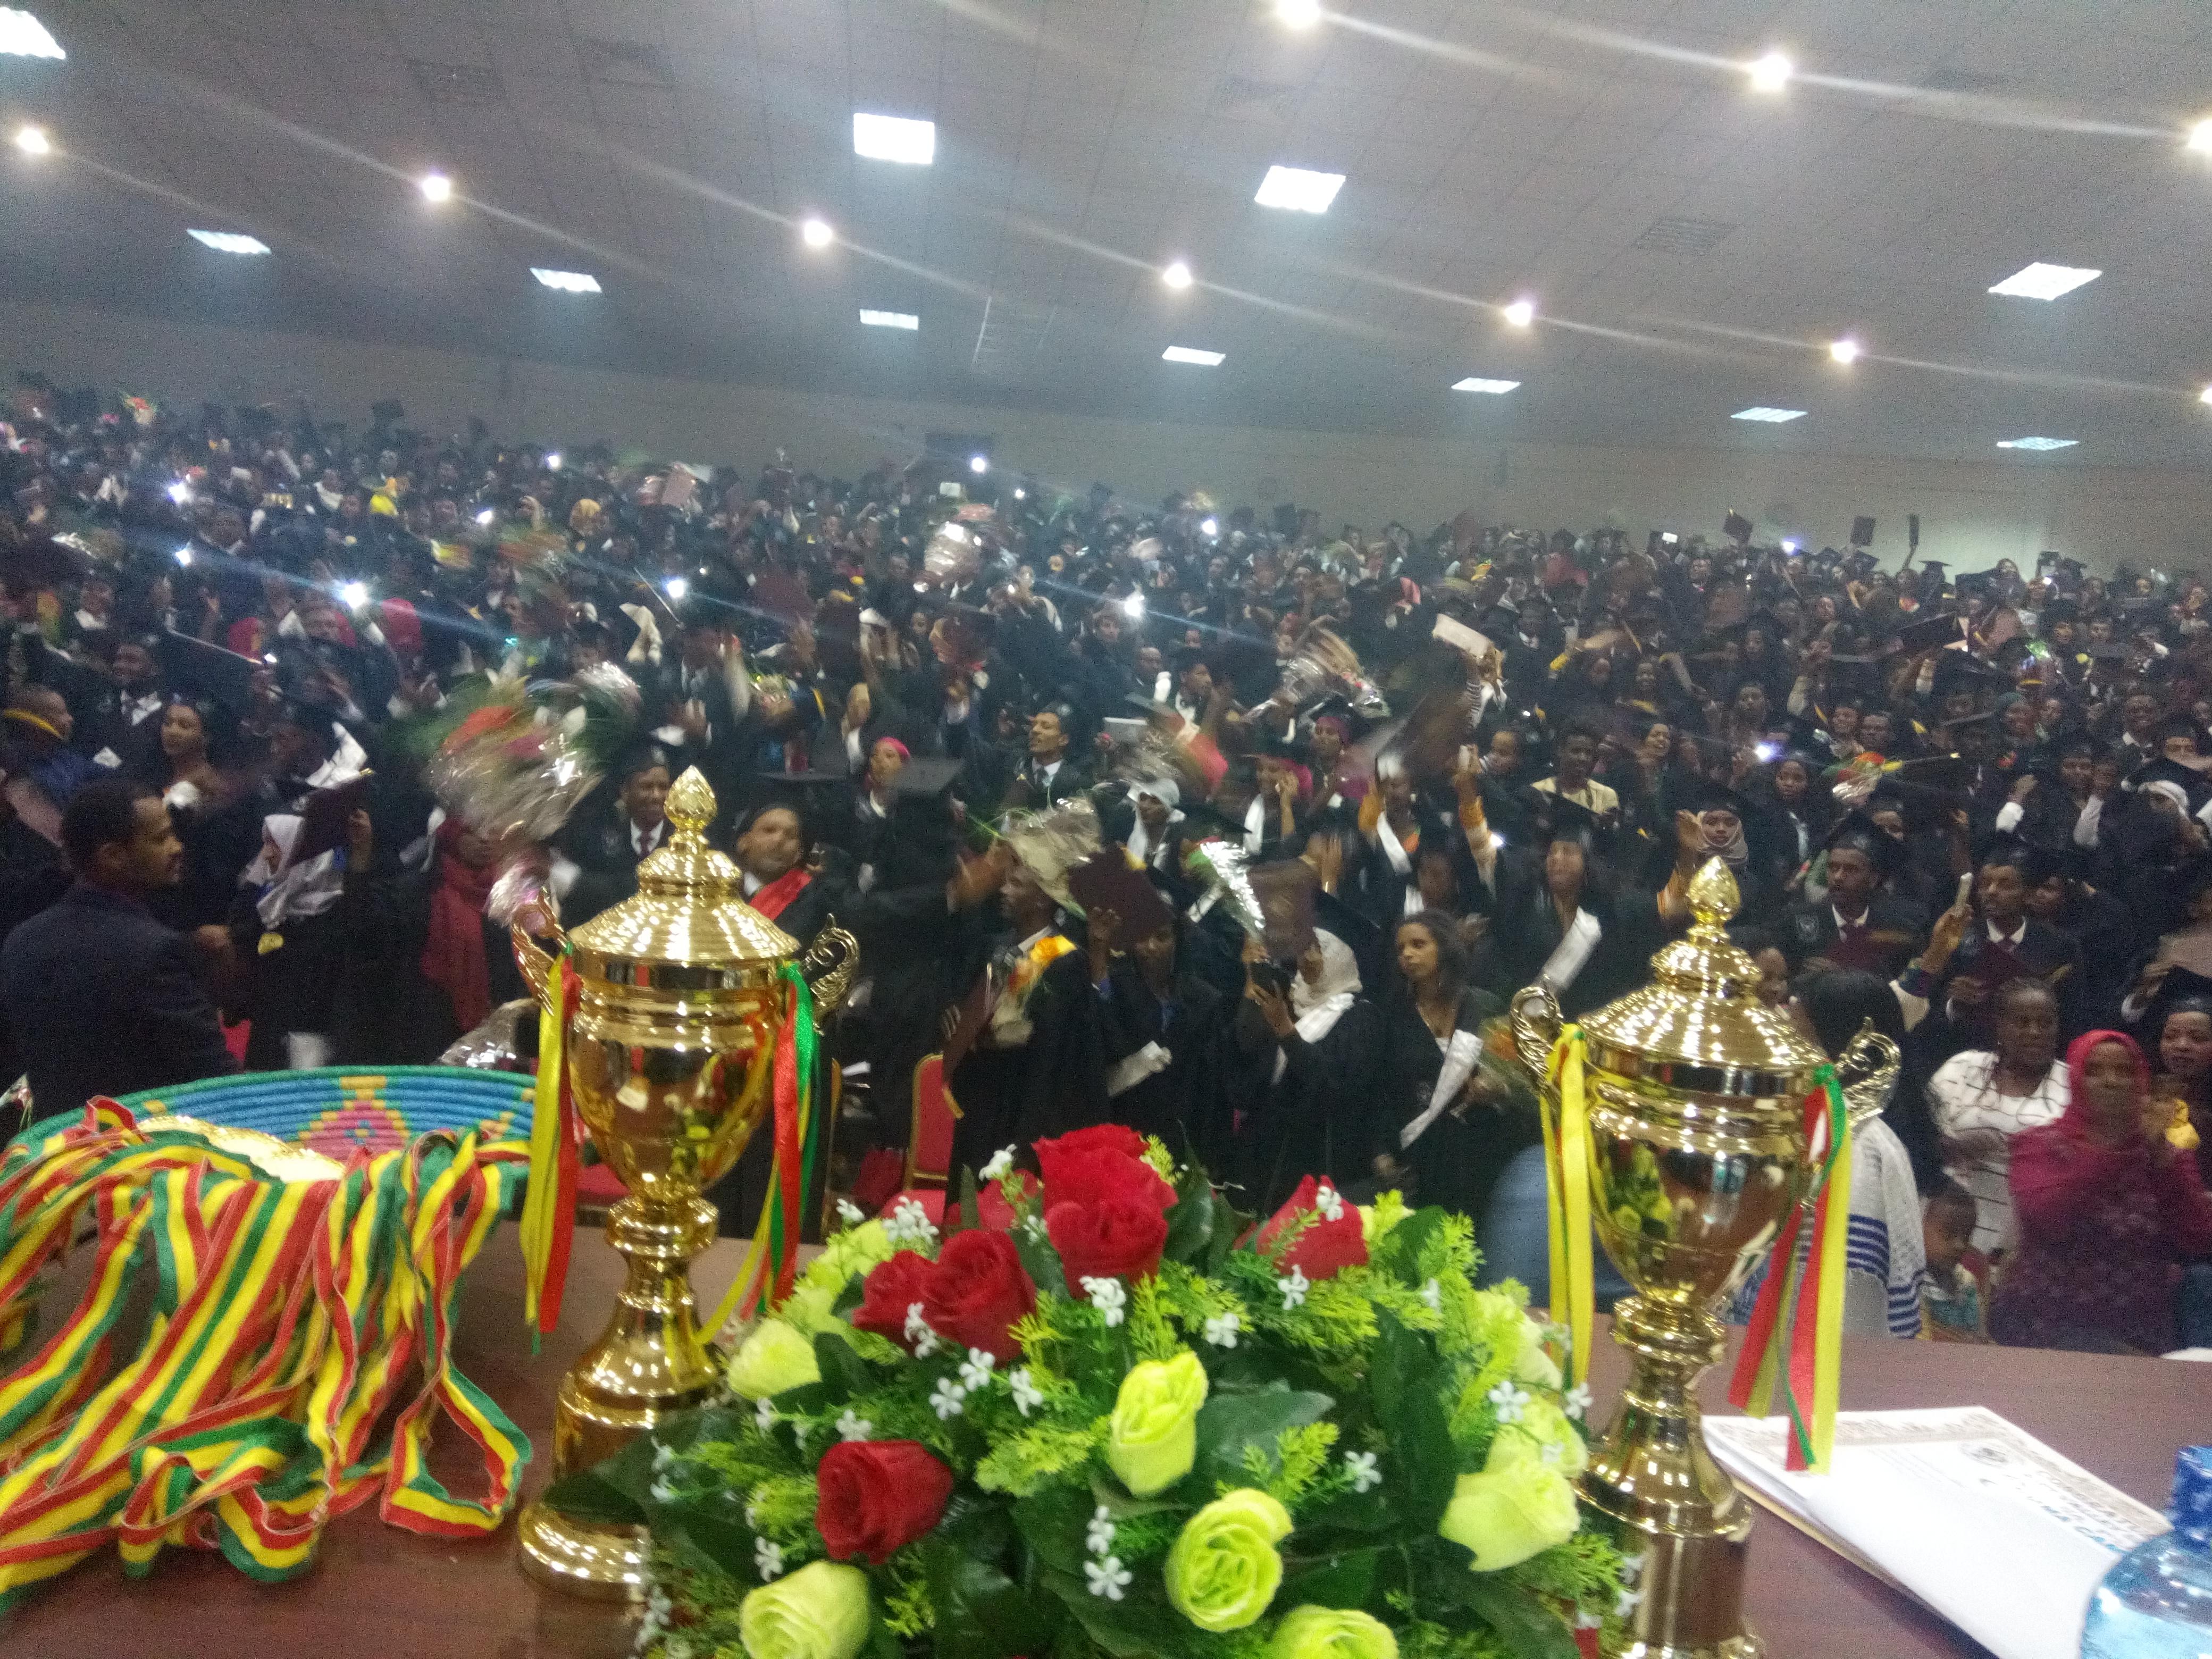 RVU-Jimma Campus Graduation Ceremony  - Rift Valley University